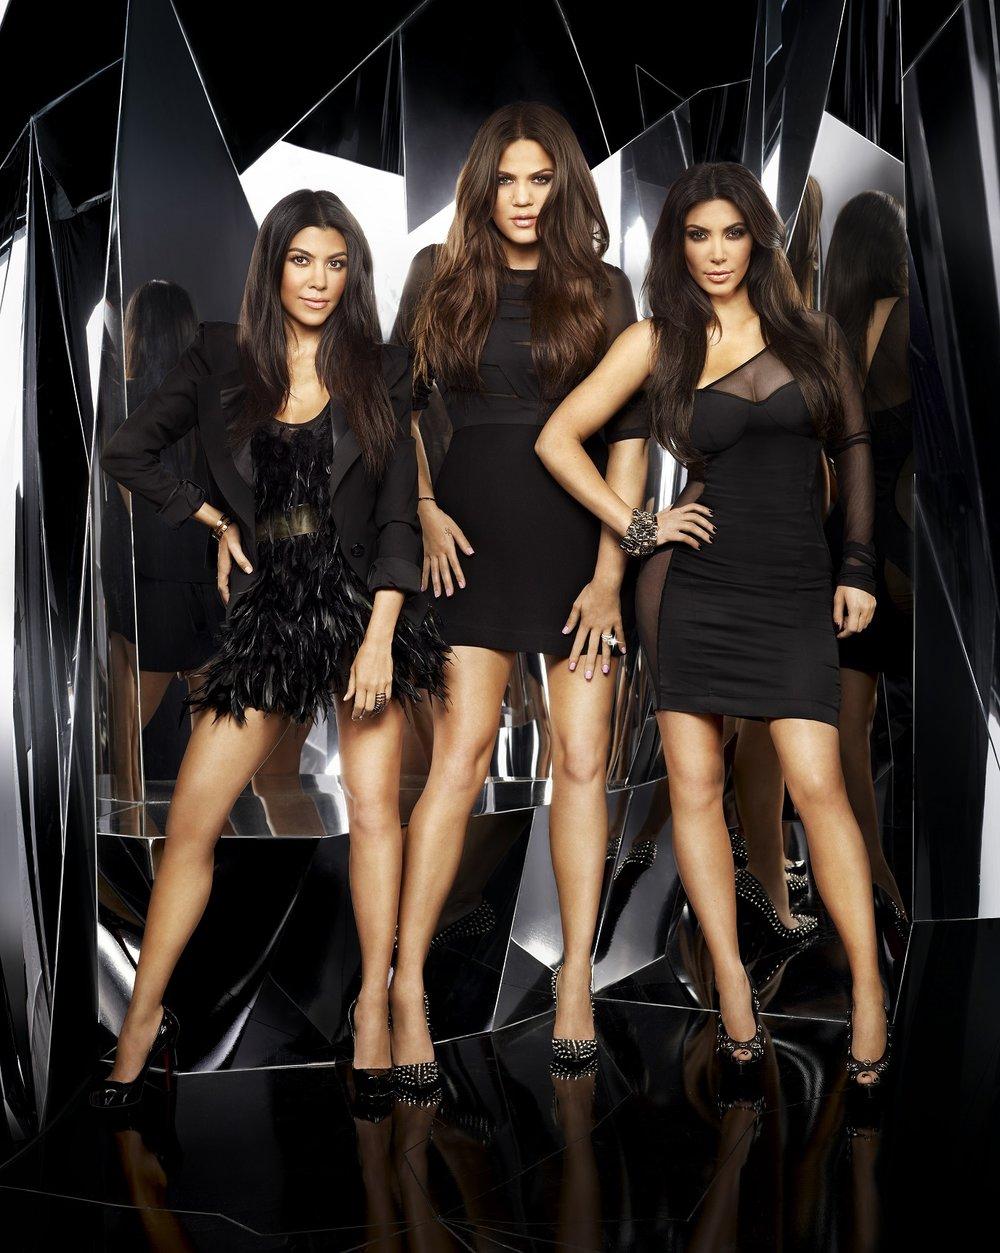 Kardashians S05 (8).jpg